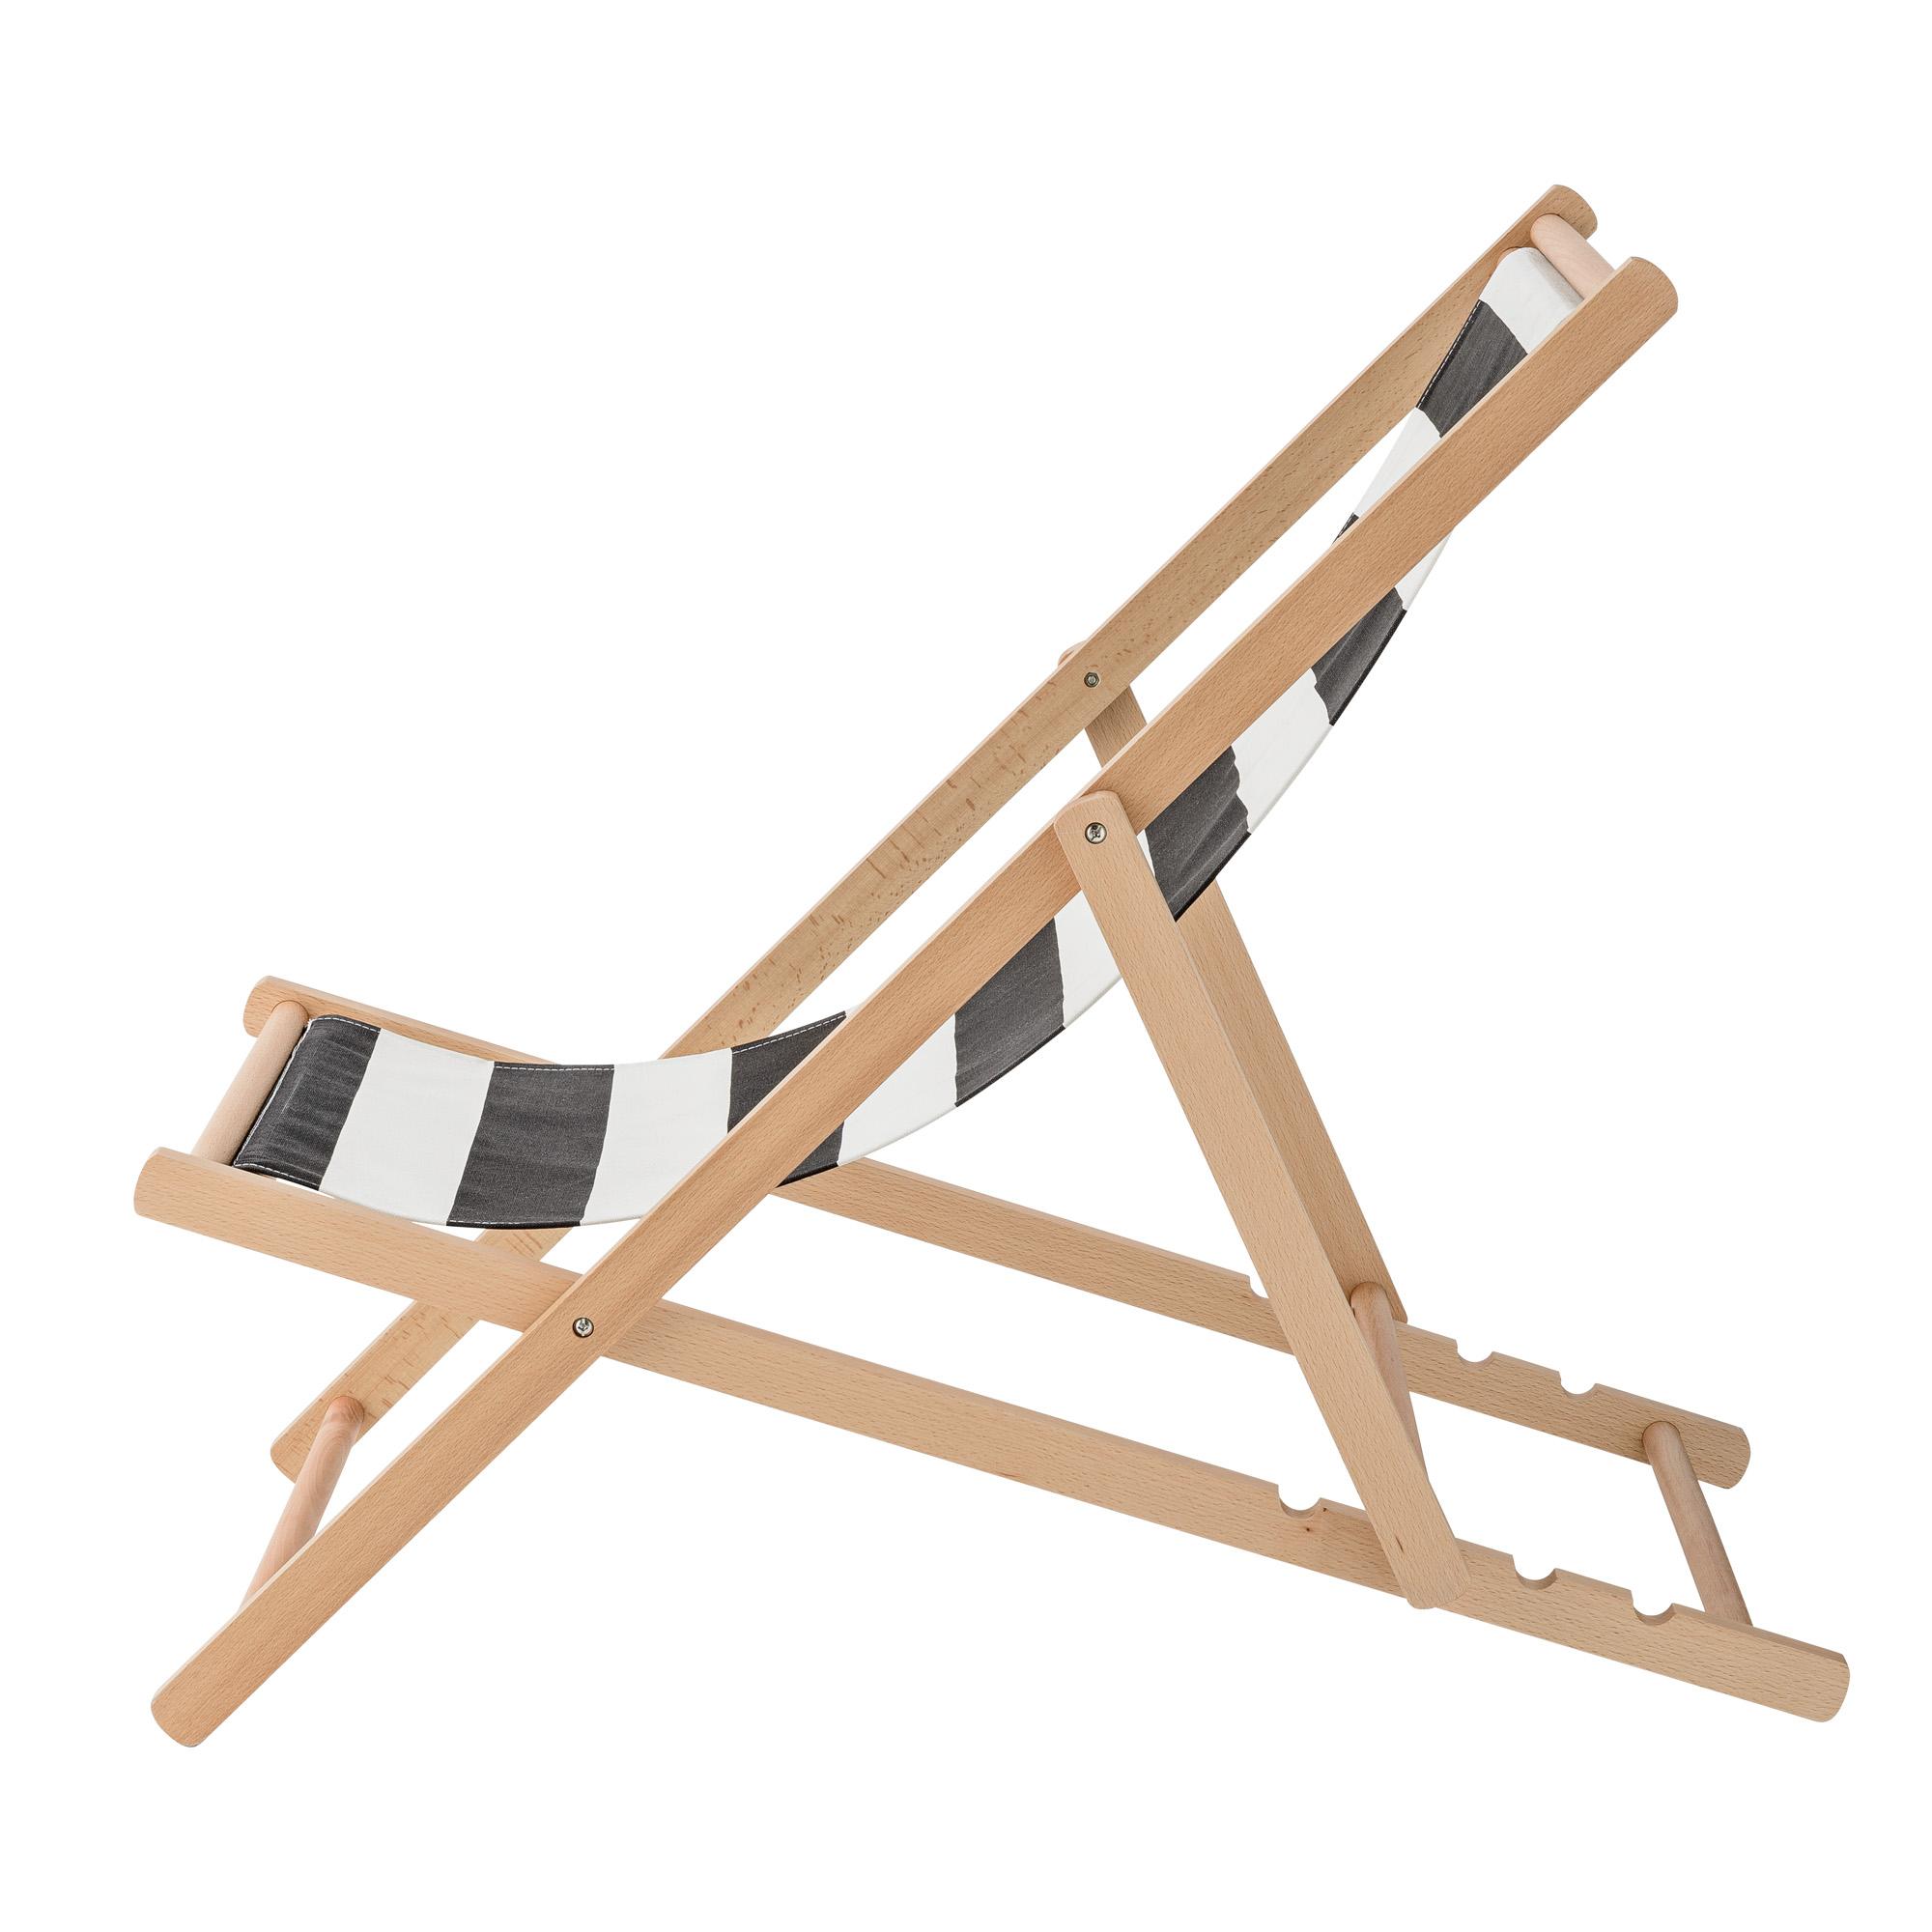 Bloomingville Deck Chair Gartenstuhl, Schwarz Weiss